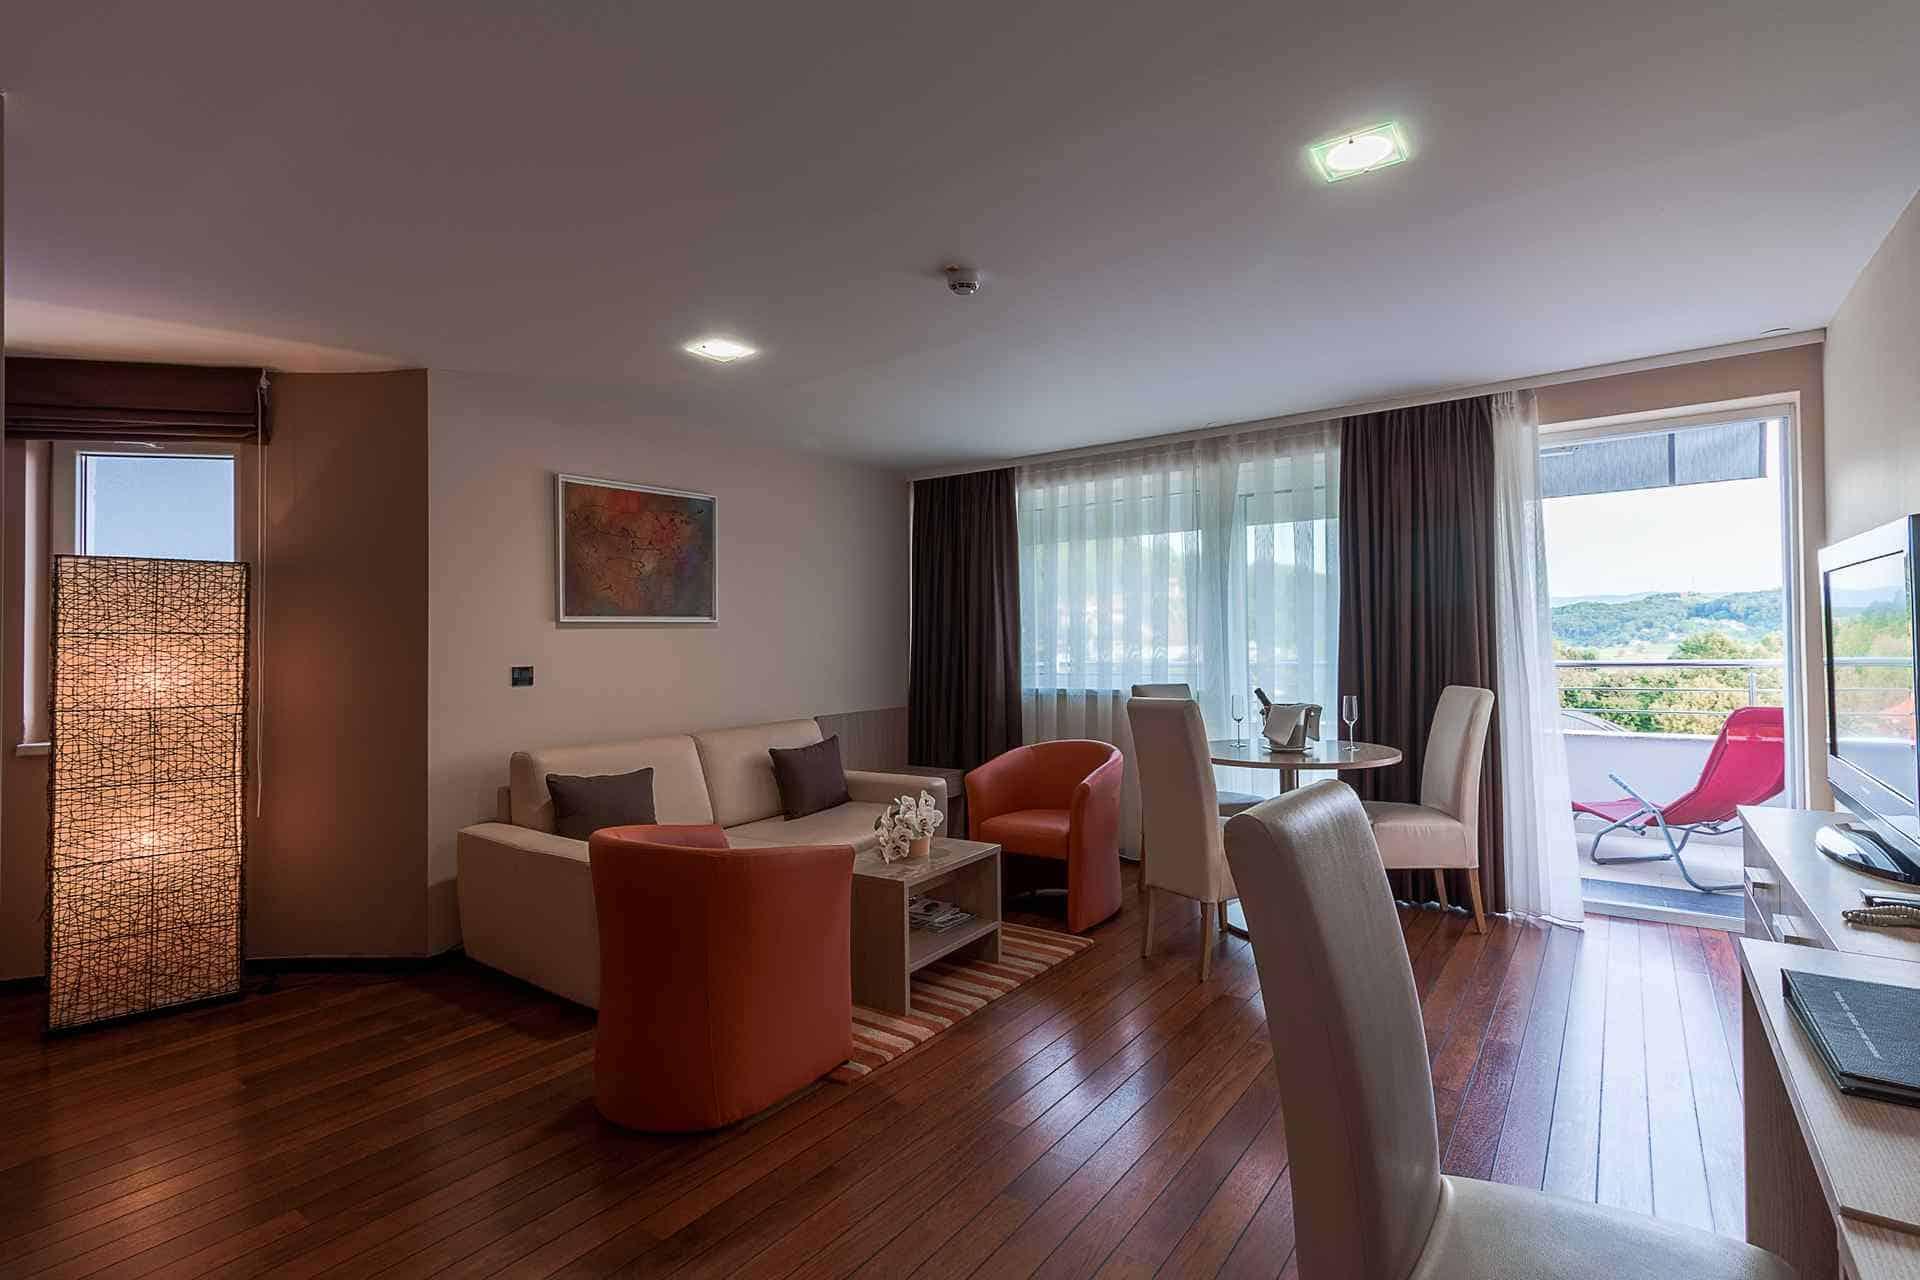 Smještaj - Spa Luxury Suite - Hotel Villa Magdalena, Krapinske Toplice